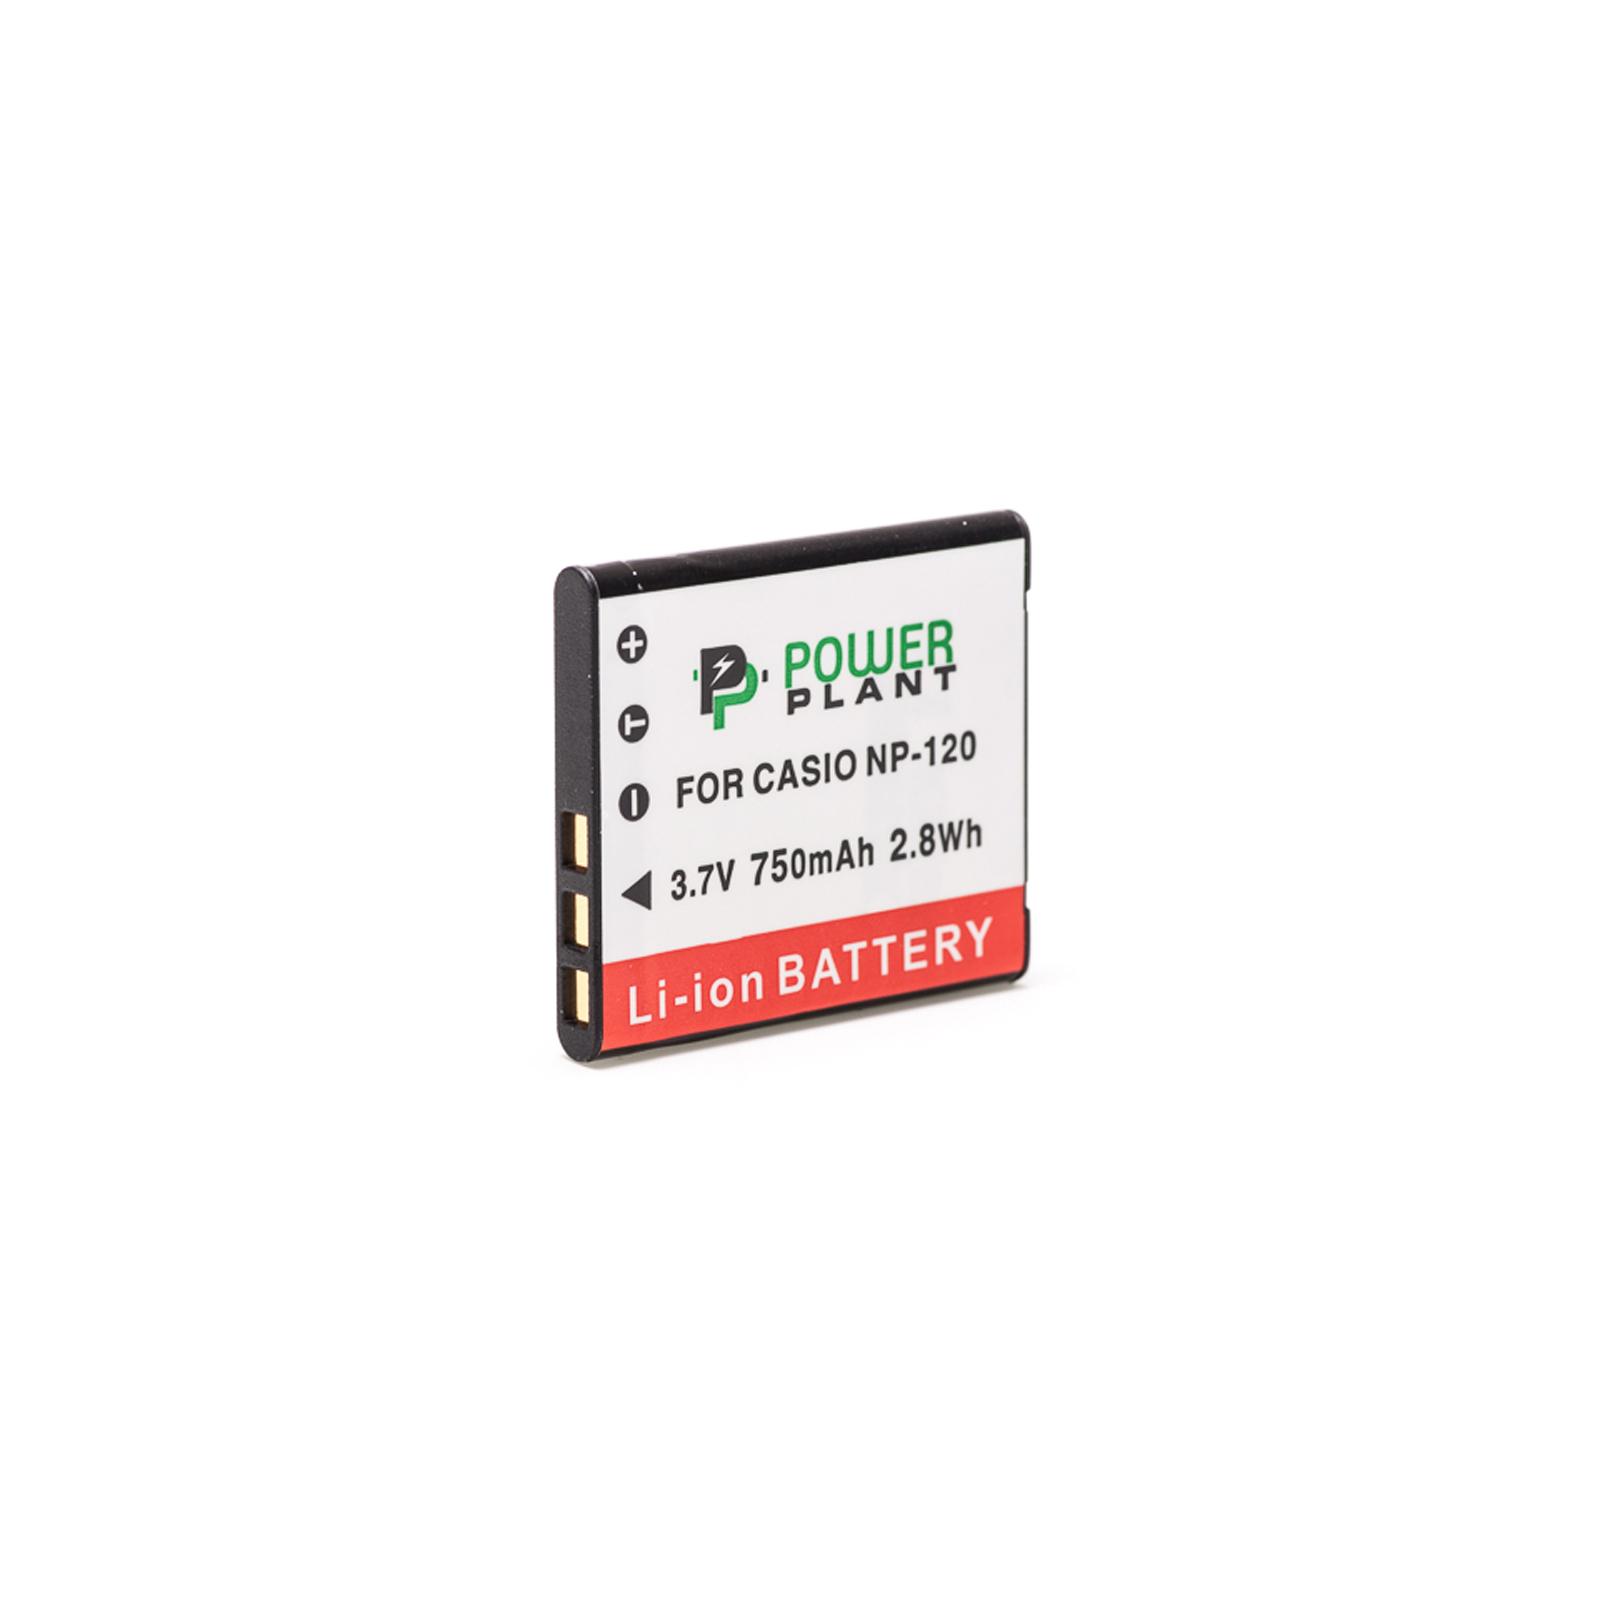 Аккумулятор к фото/видео PowerPlant Casio NP-120 (DV00DV1312) изображение 2